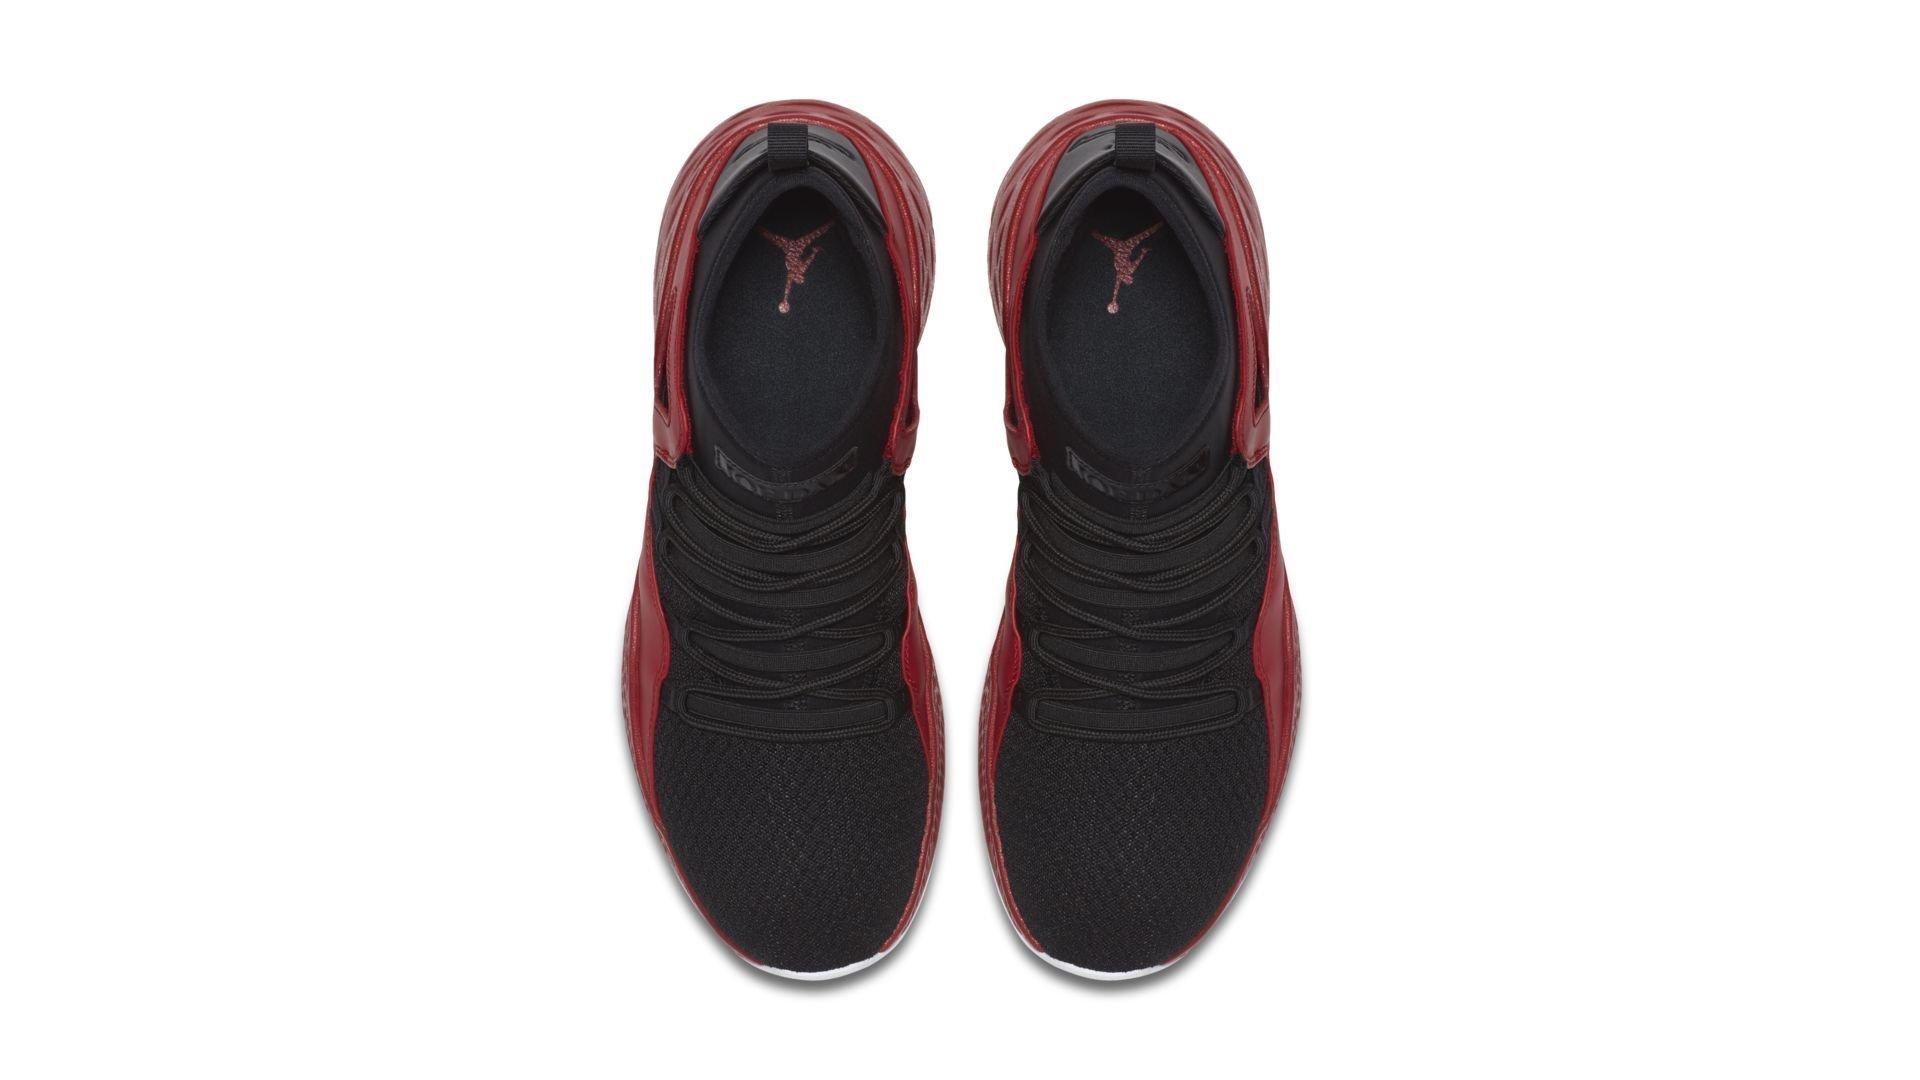 Jordan Formula 23 Black Gym Red (881465-001)